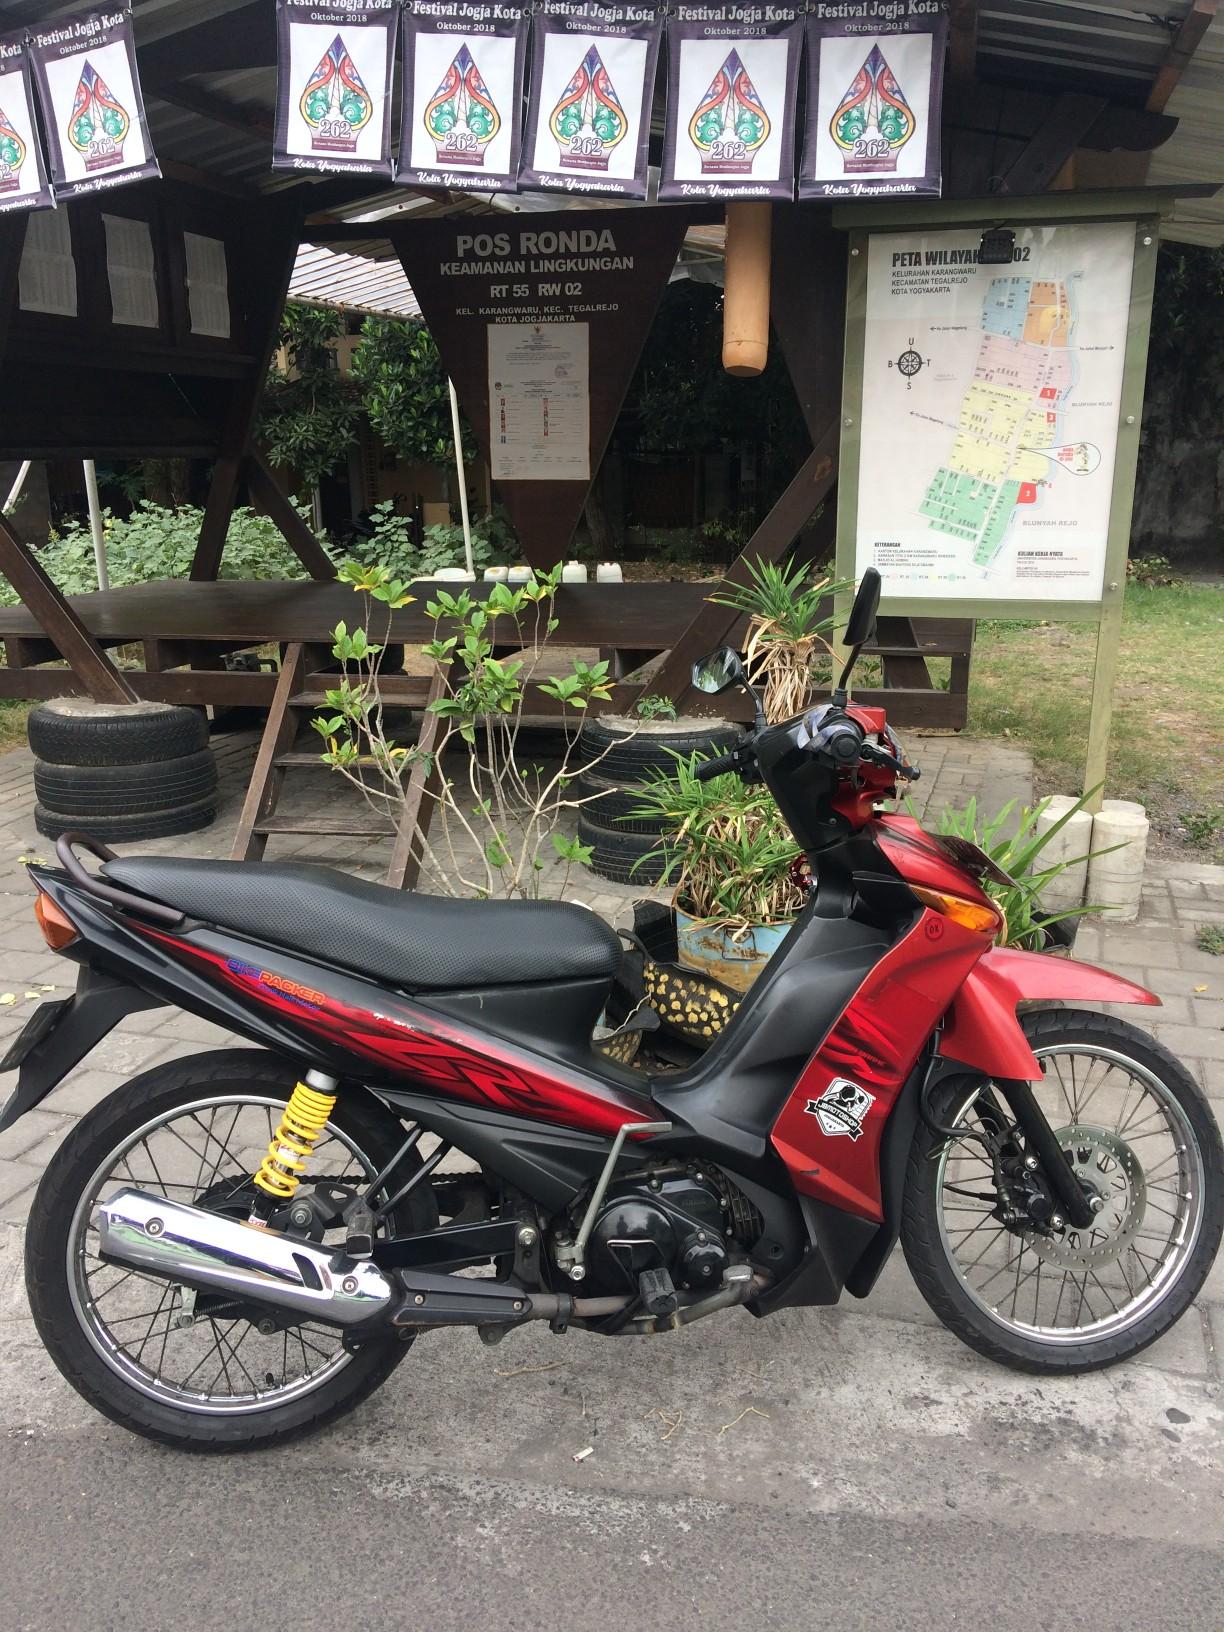 Nambah kuda besi baru, Yamaha Vega ZR